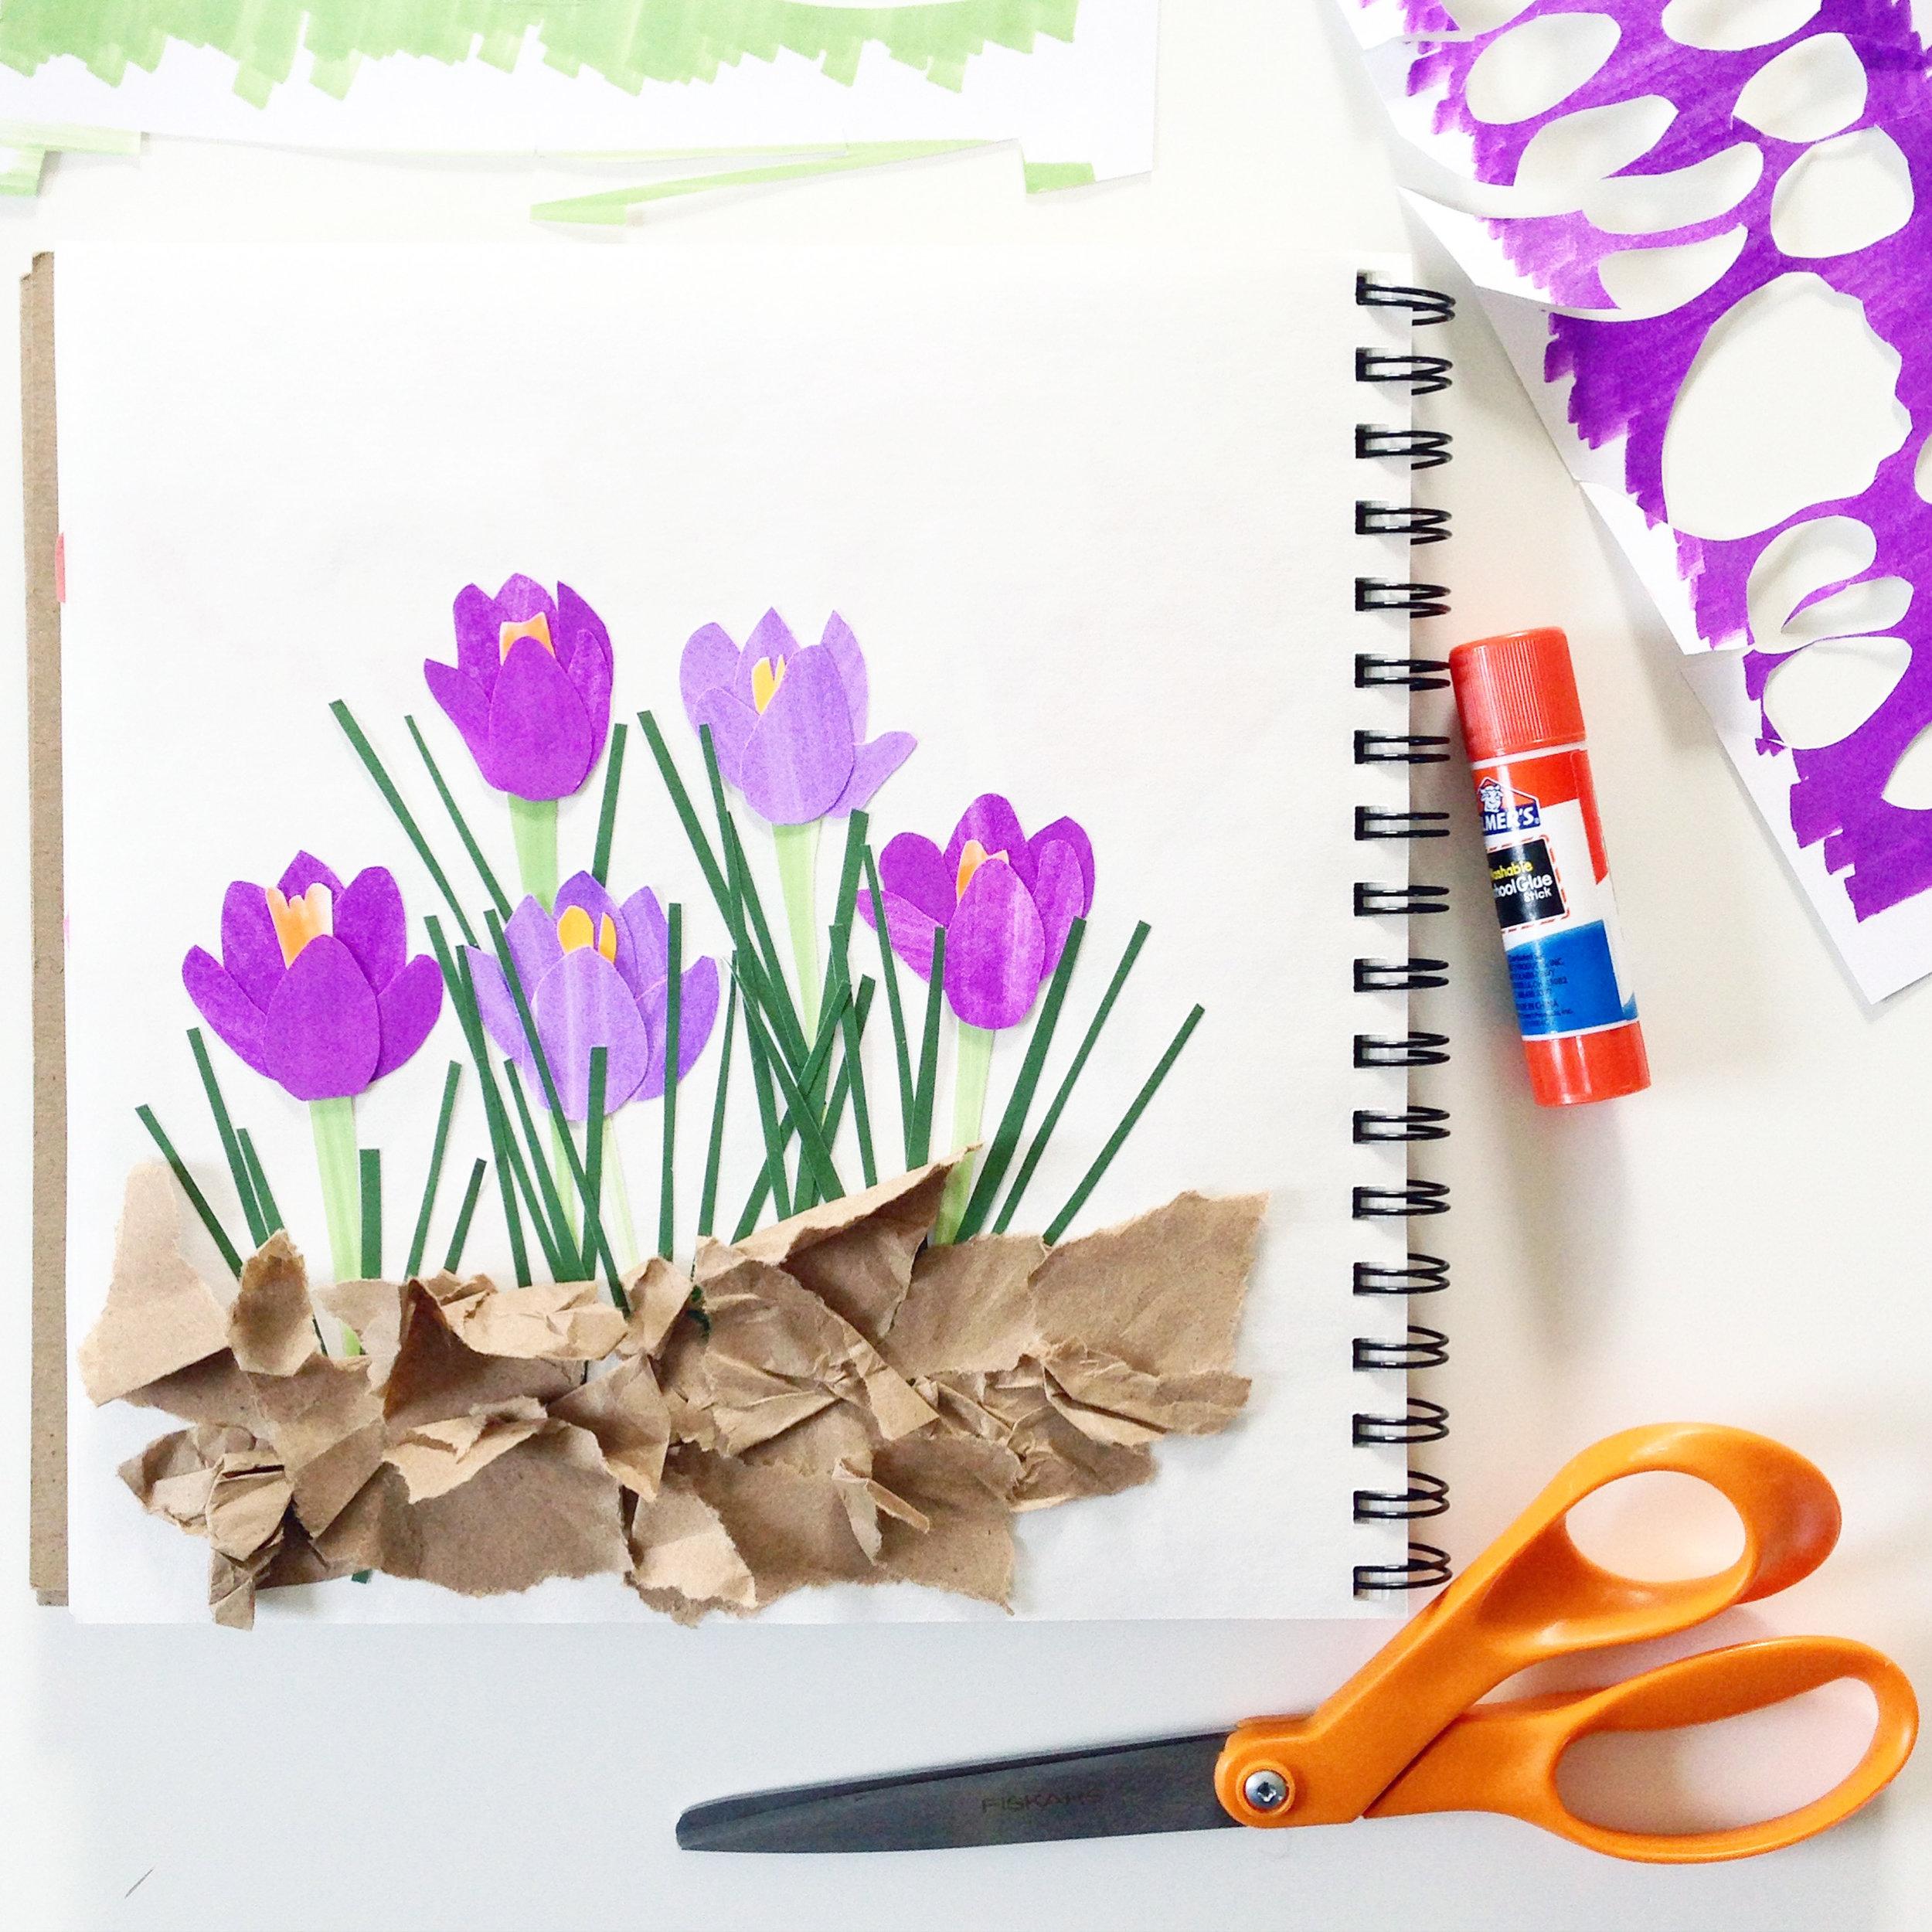 Crocus Collage in Anne Butera's Sketchbook